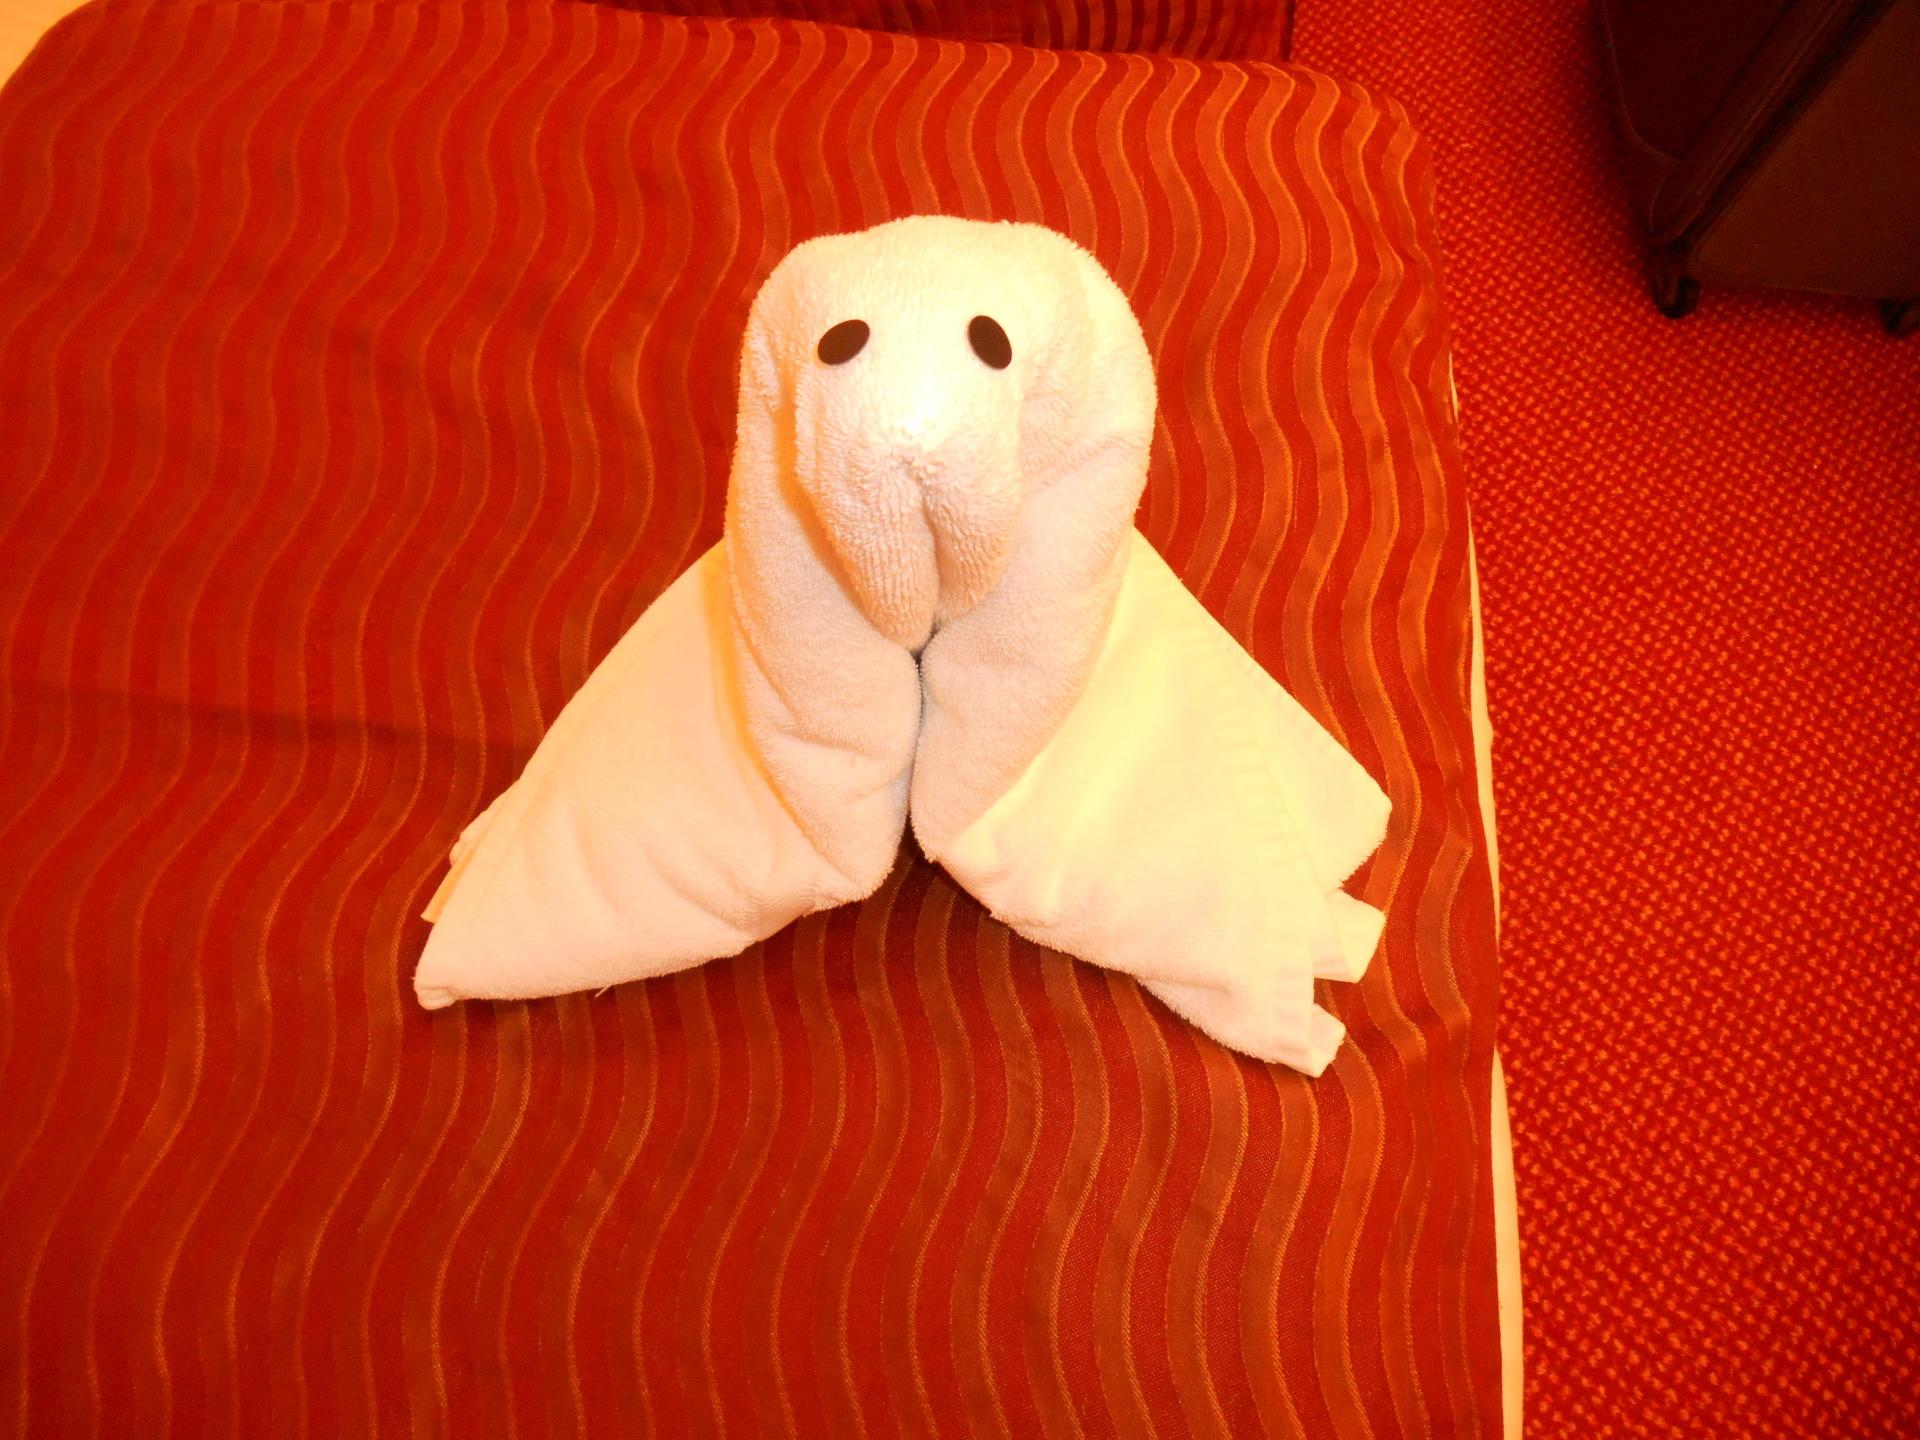 towel animals, carnival magic